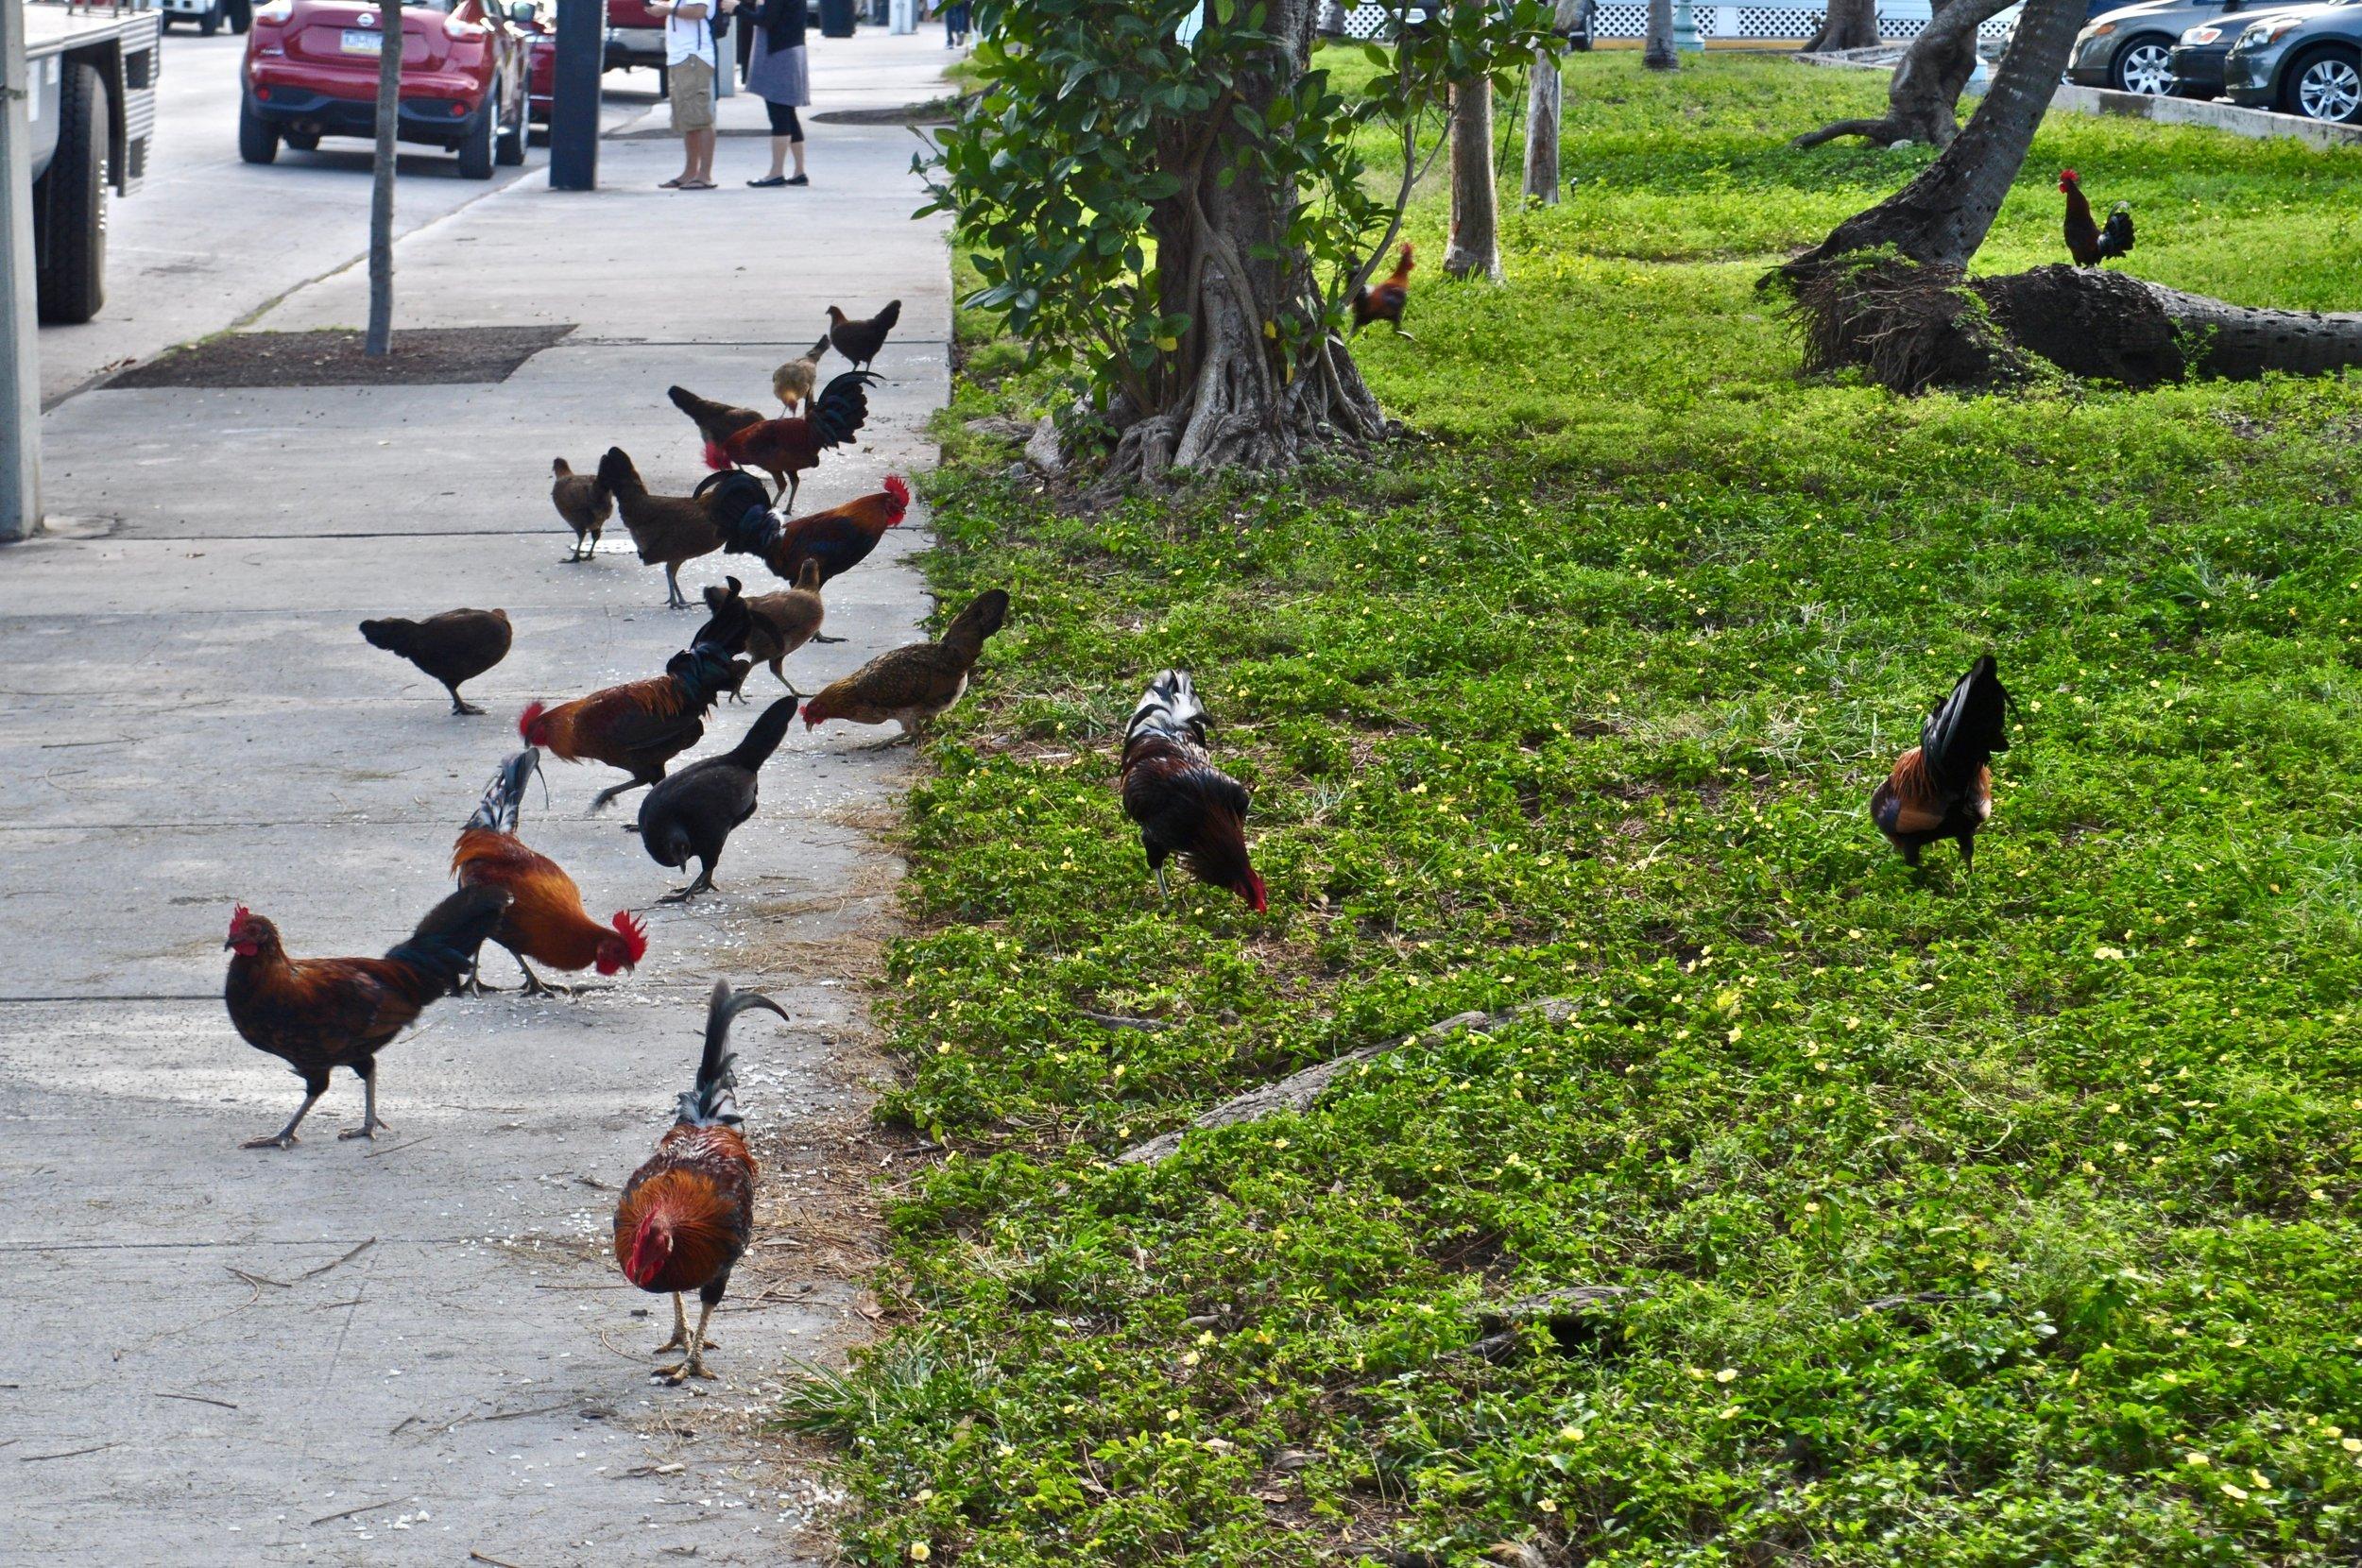 Self-Guided Walking Tour of Key West - A Happy Passport #keywest #florida #cruise #USA